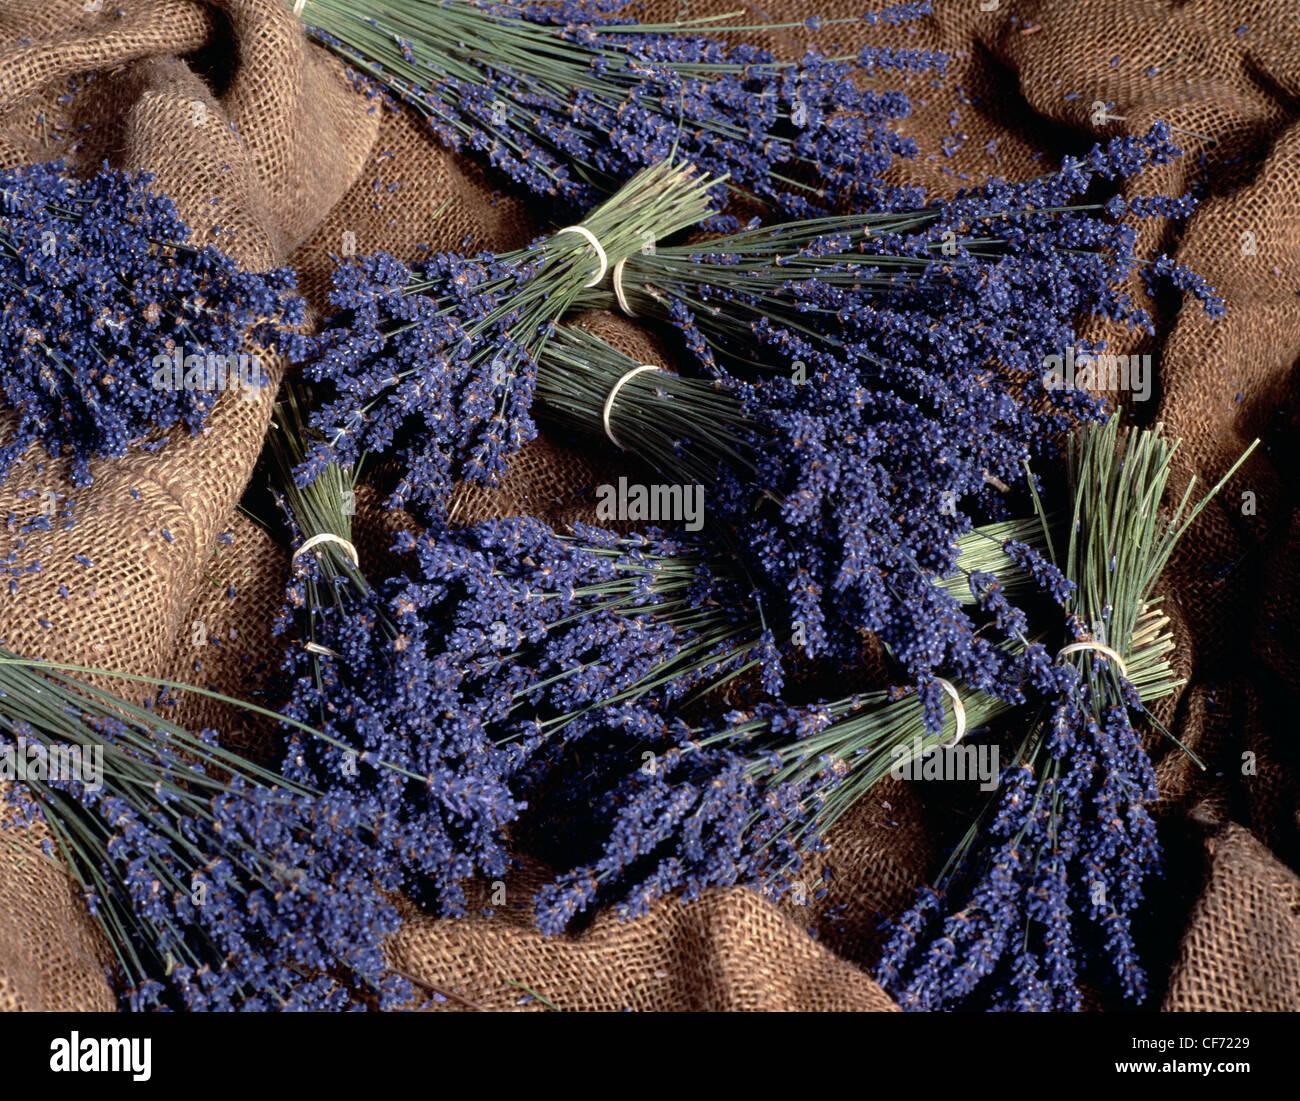 Norfolk LavenderBunches of lavender on canvas sacks - Stock Image